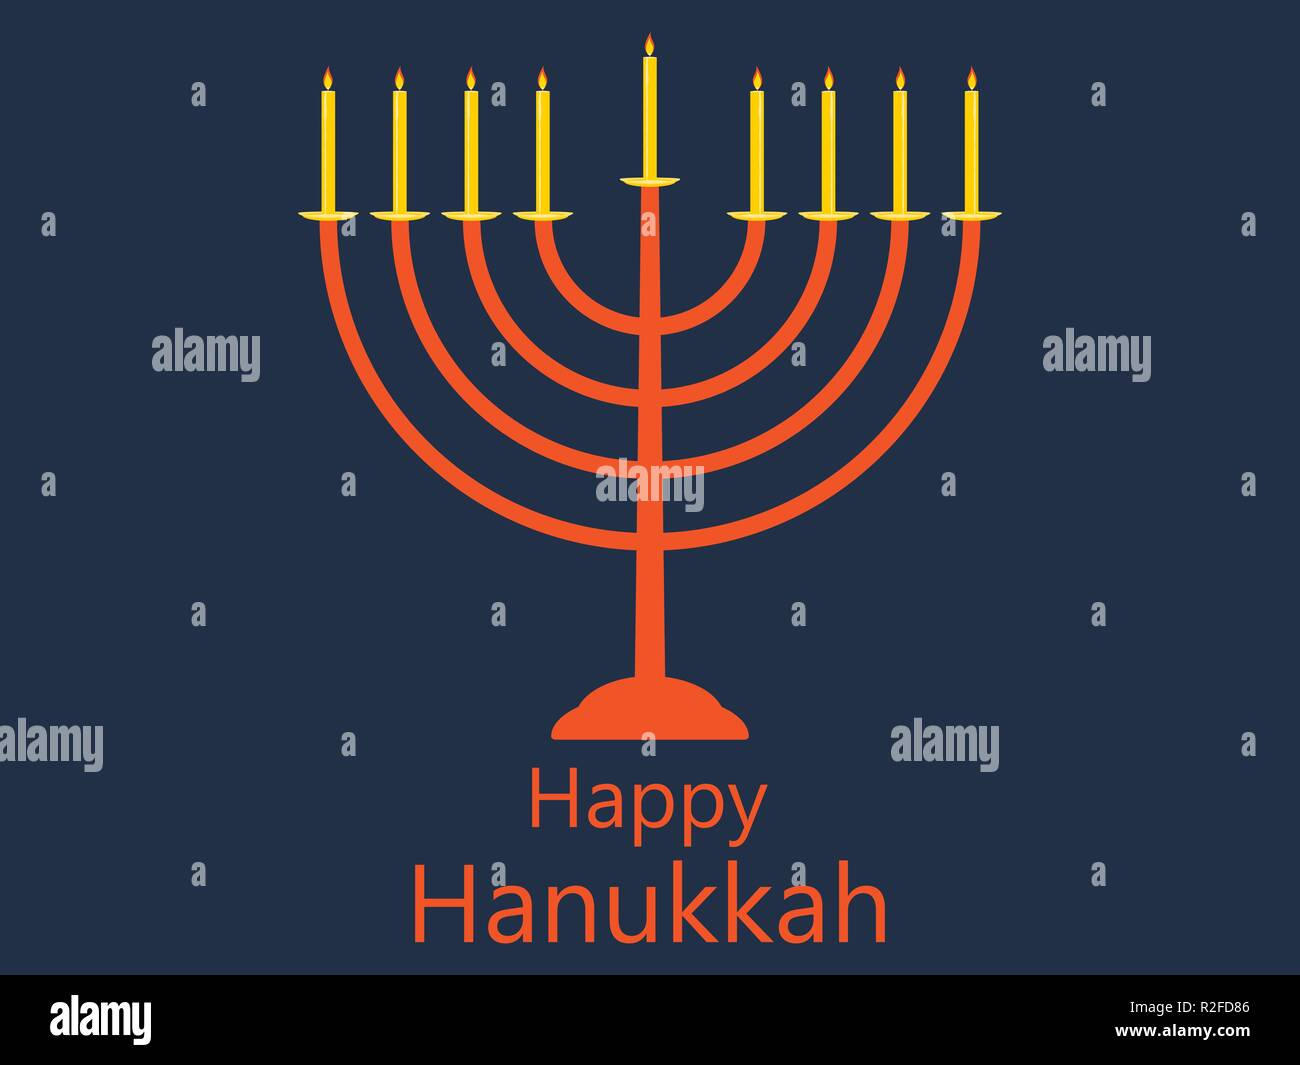 Happy hanukkah. Hanukkah candles. Menorah with nine candles. Vector illustration Stock Vector